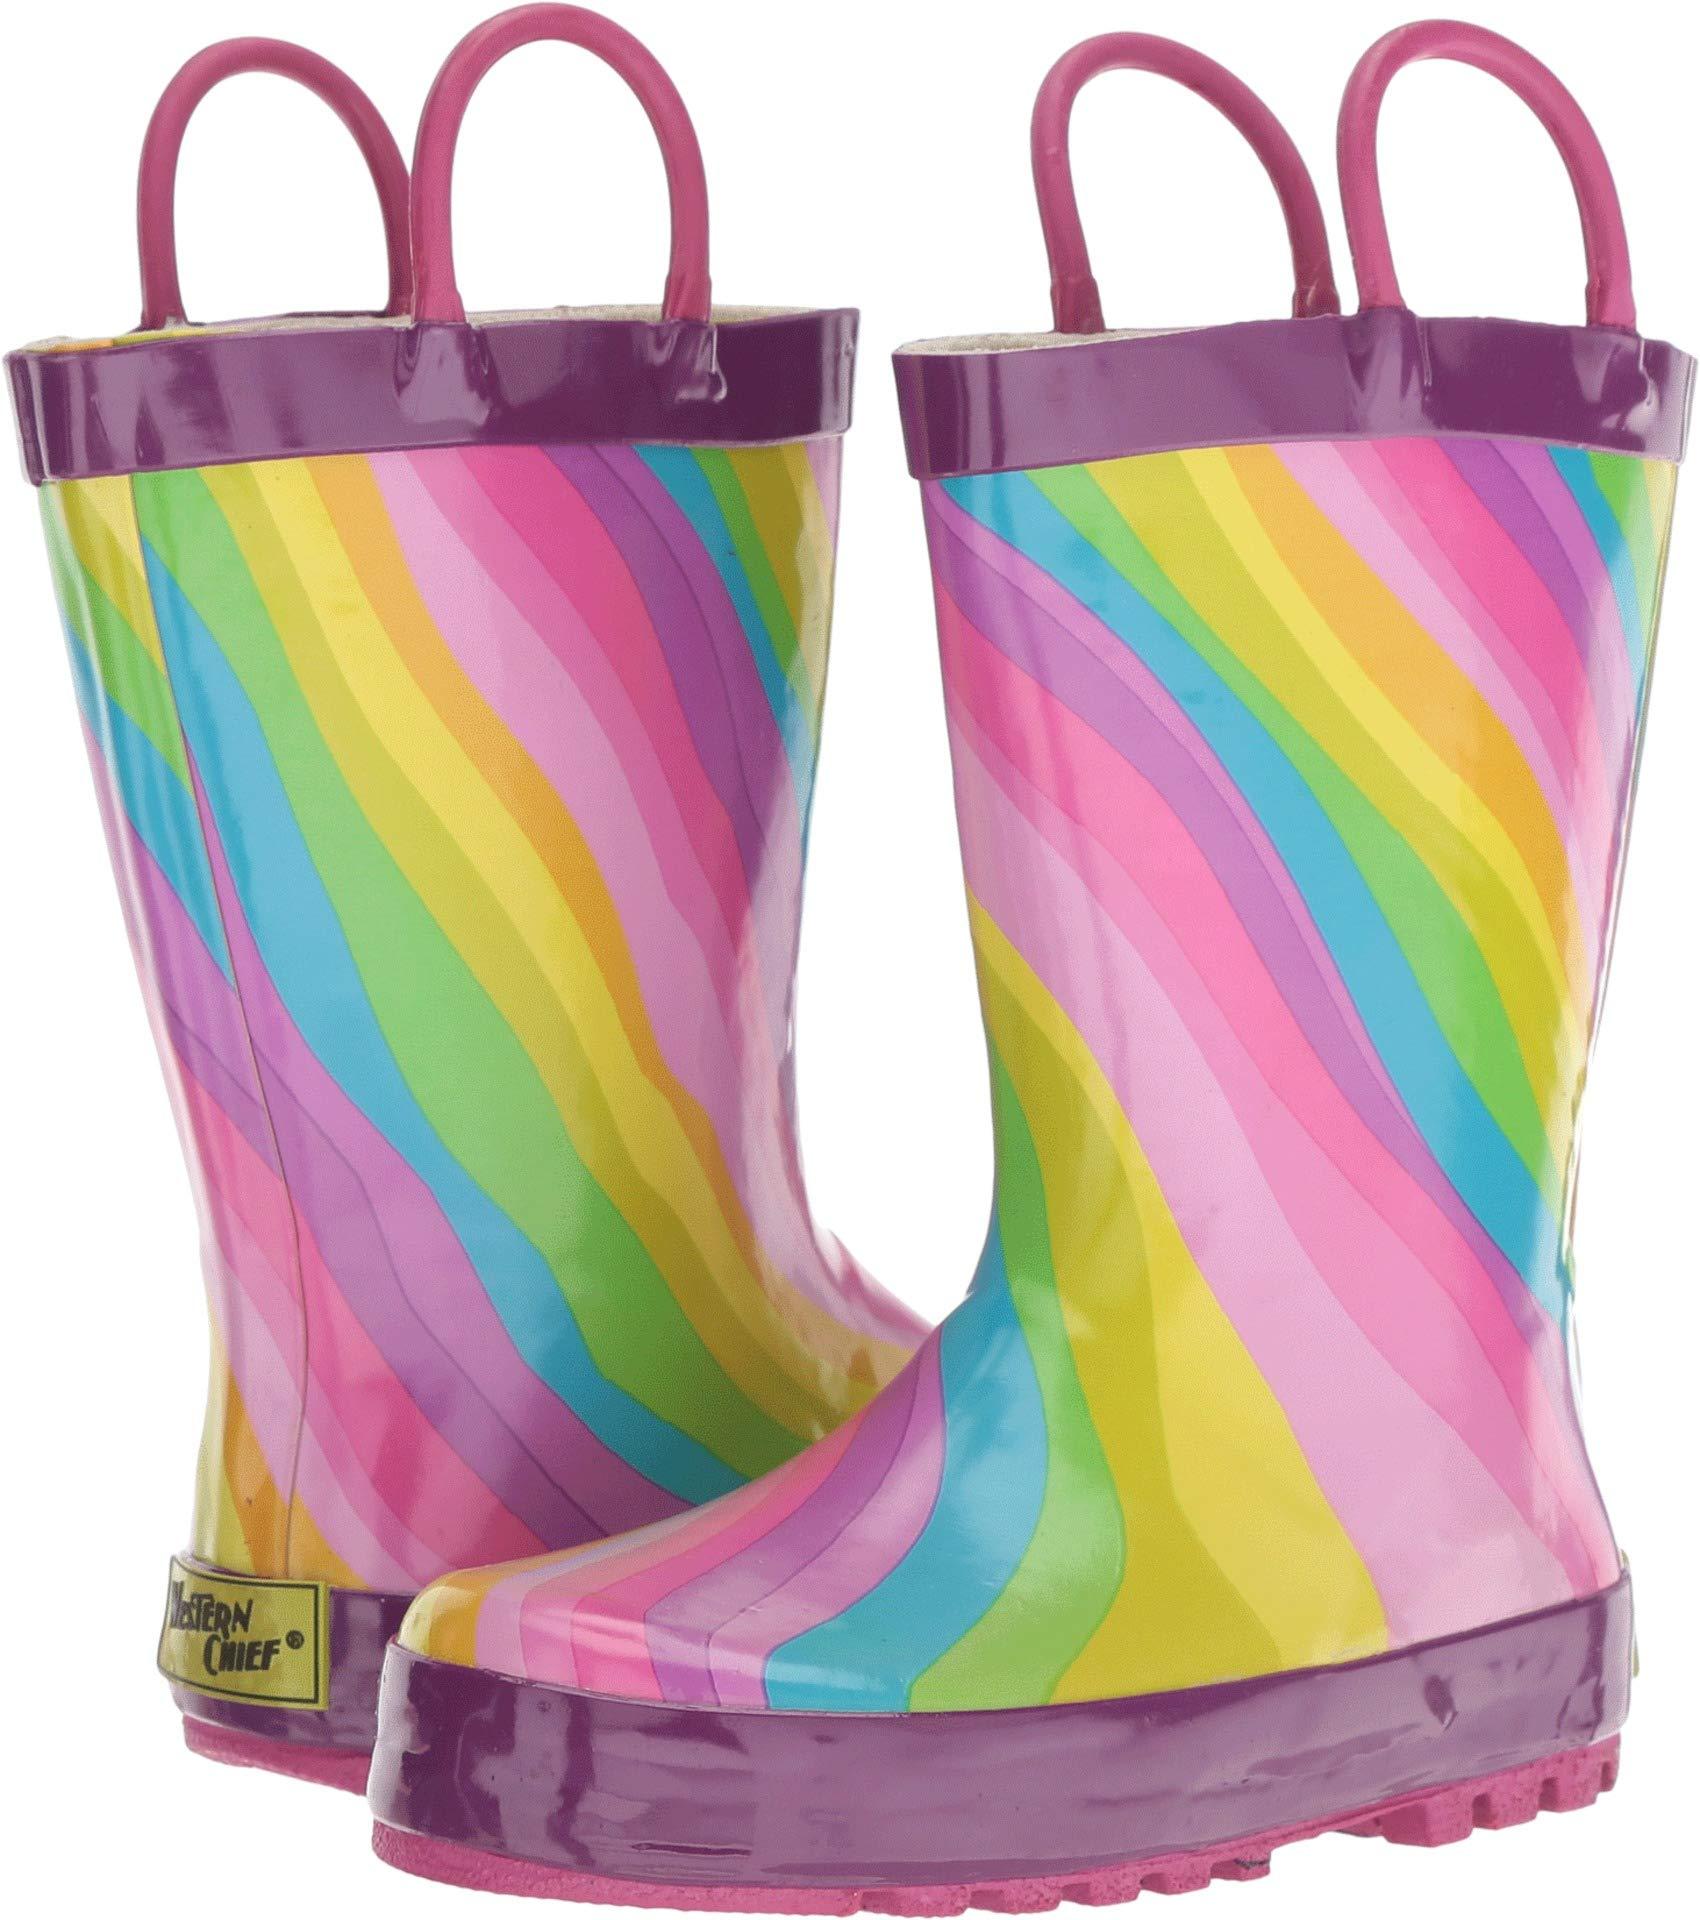 Western Chief Girls' Waterproof Printed Rain Boot, Rainbow, 13/1 Medium US Little Kid